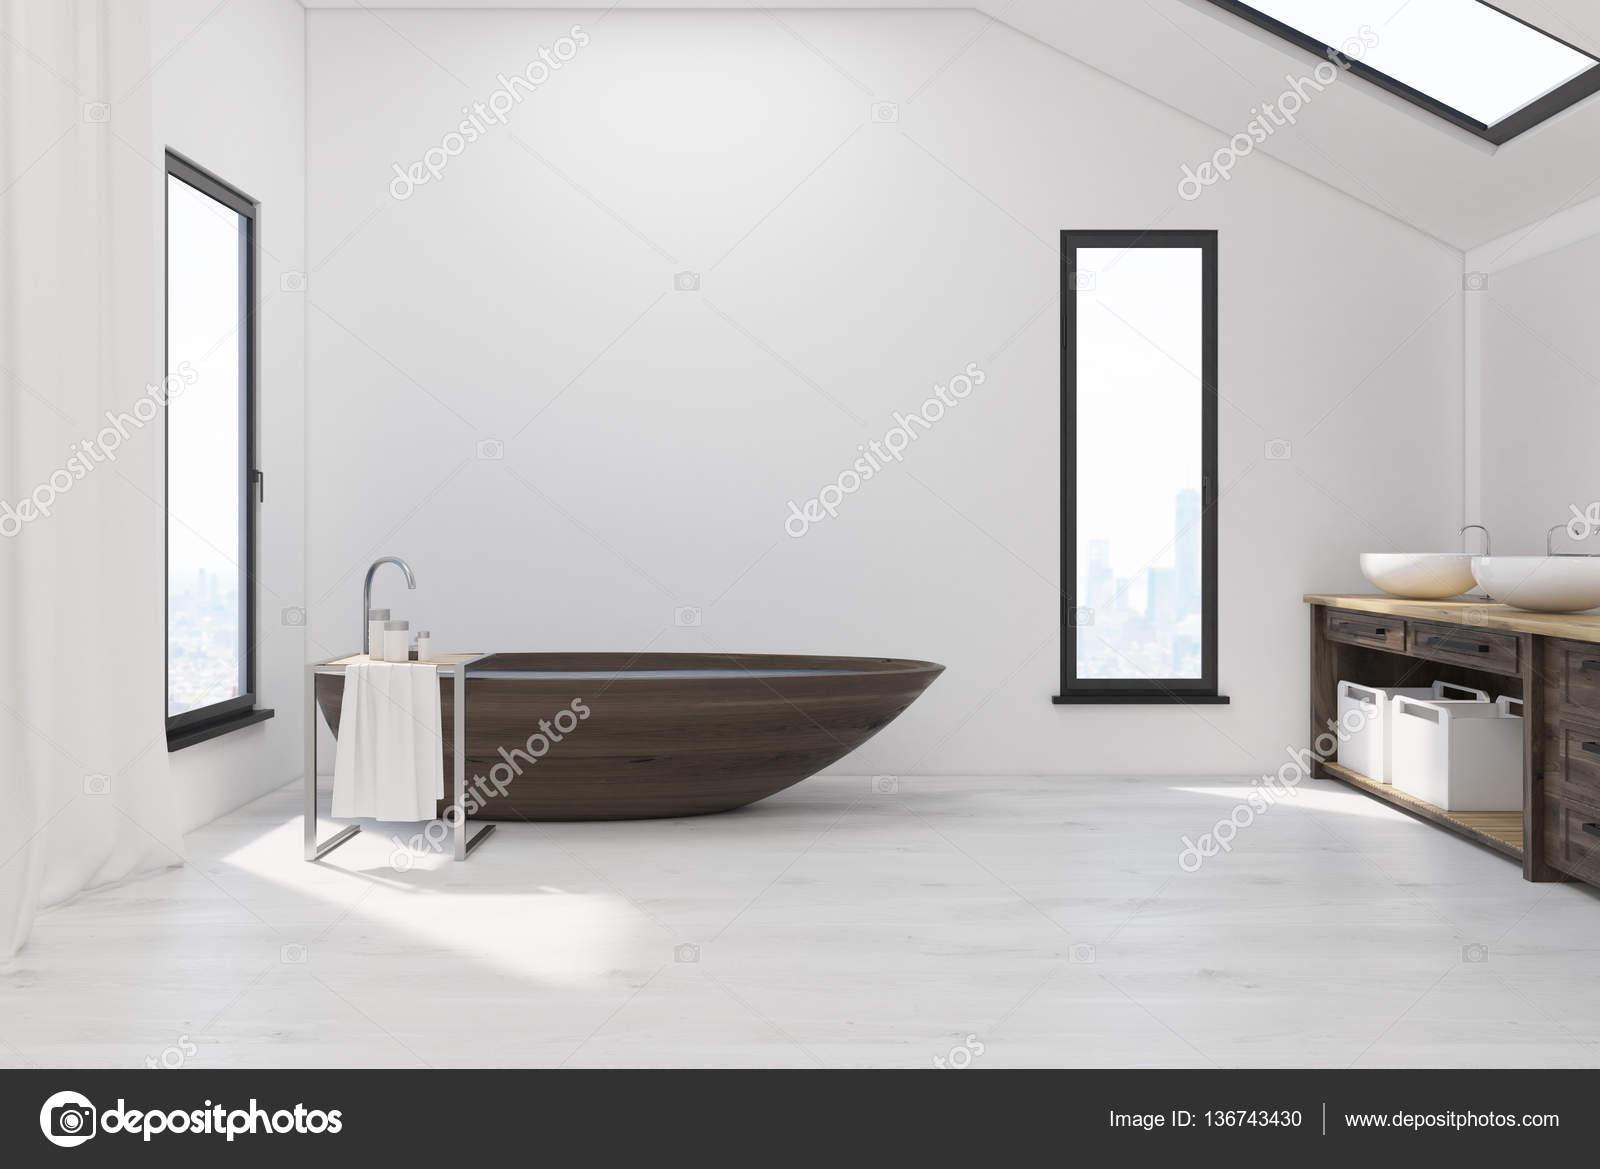 Bagno piano mansardato con vasca in legno foto stock - Vasca bagno legno ...